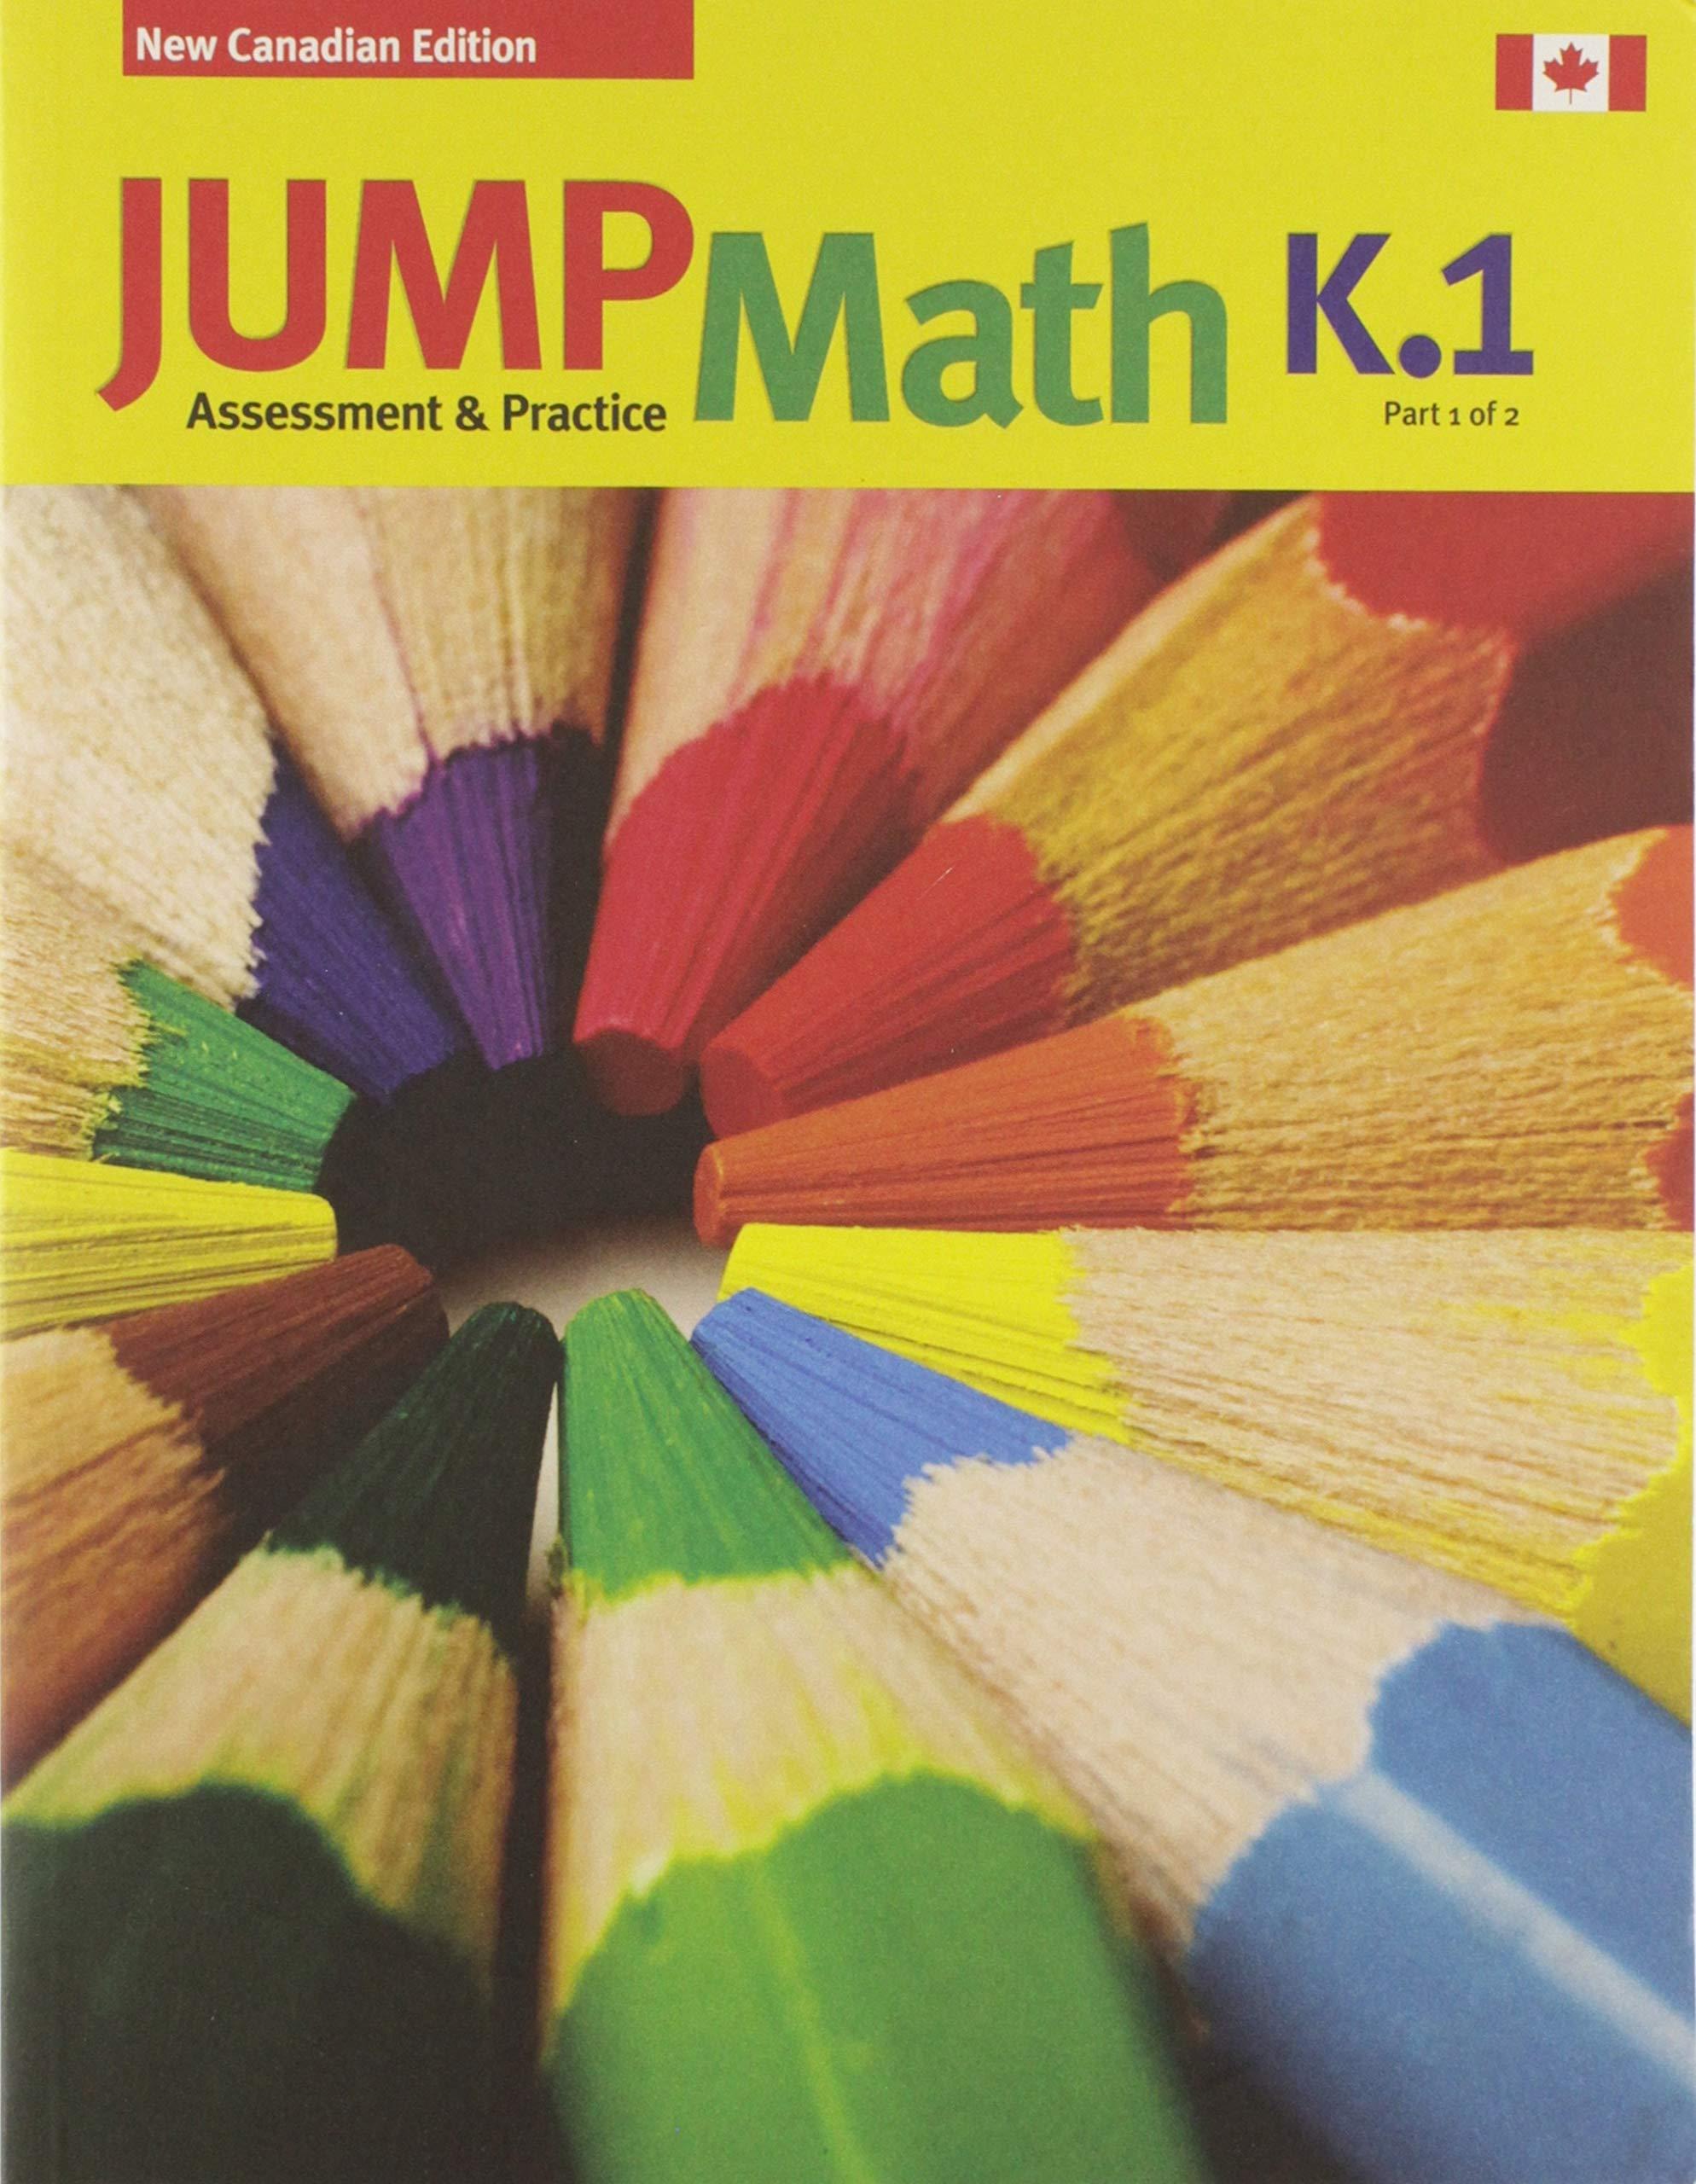 JUMP Math AP Book K.1: Canadian Edition: Amazon.ca: John Mighton: Books